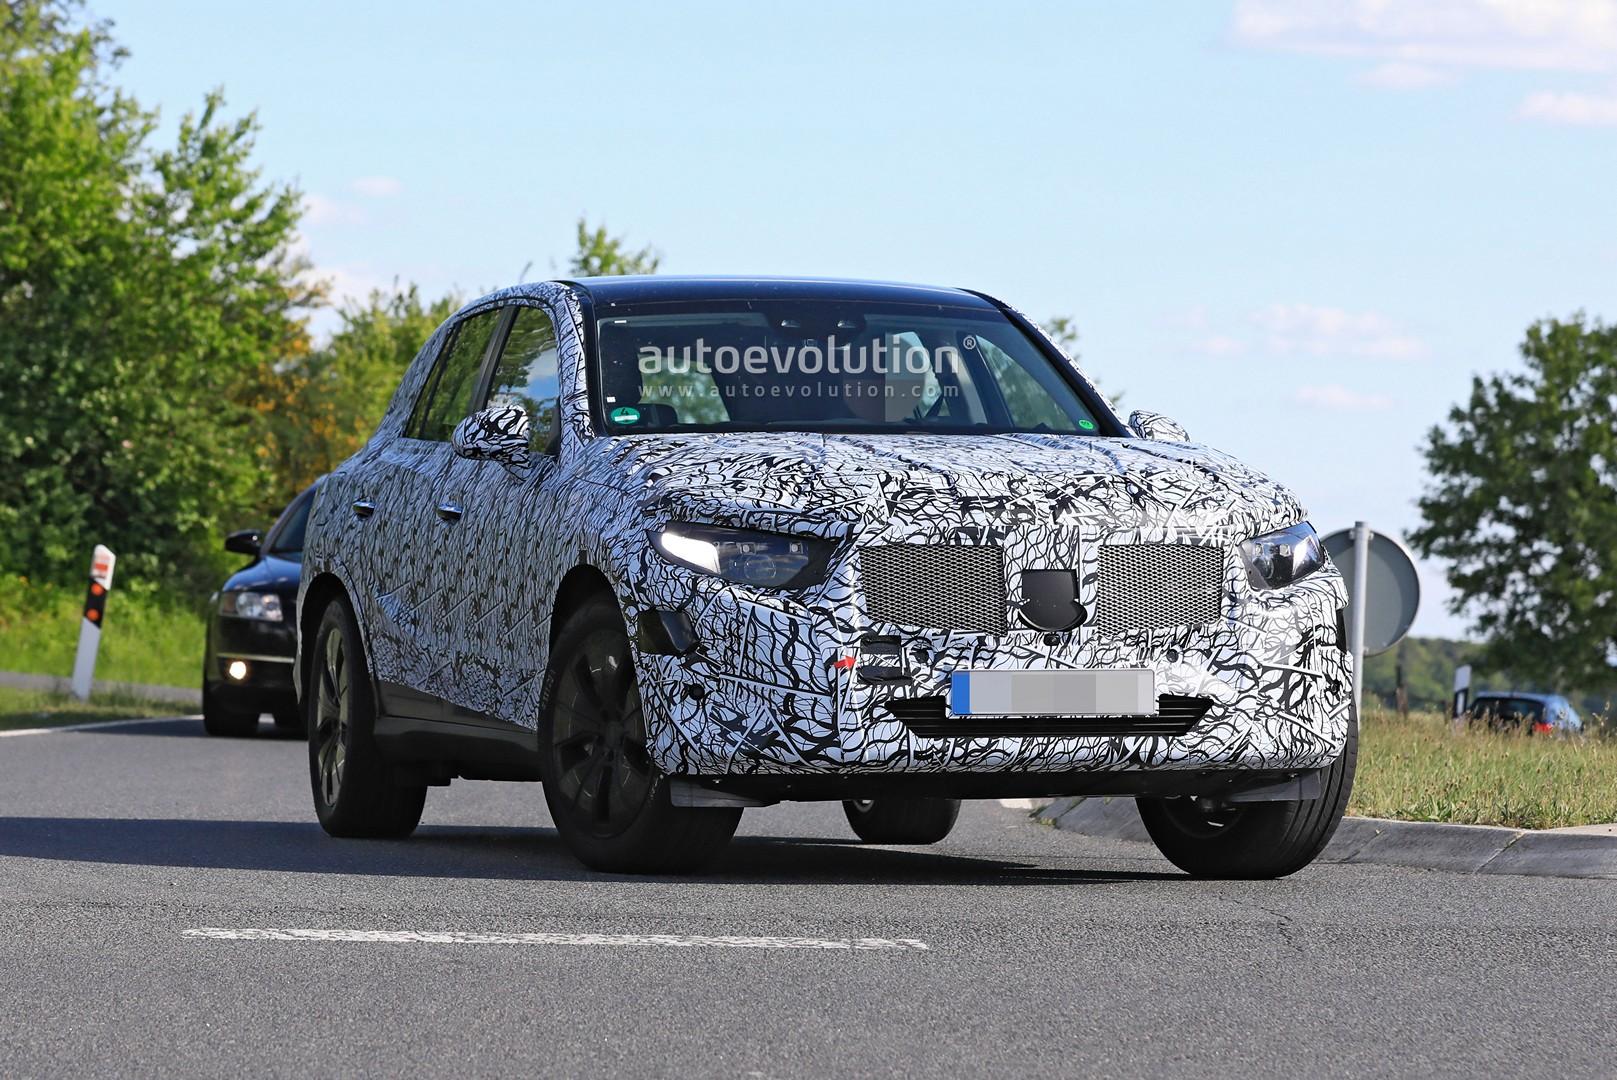 2021 - [Mercedes-Benz] GLC II 2022-mercedes-benz-glc-class-spied-up-close-looks-bigger-144220_1